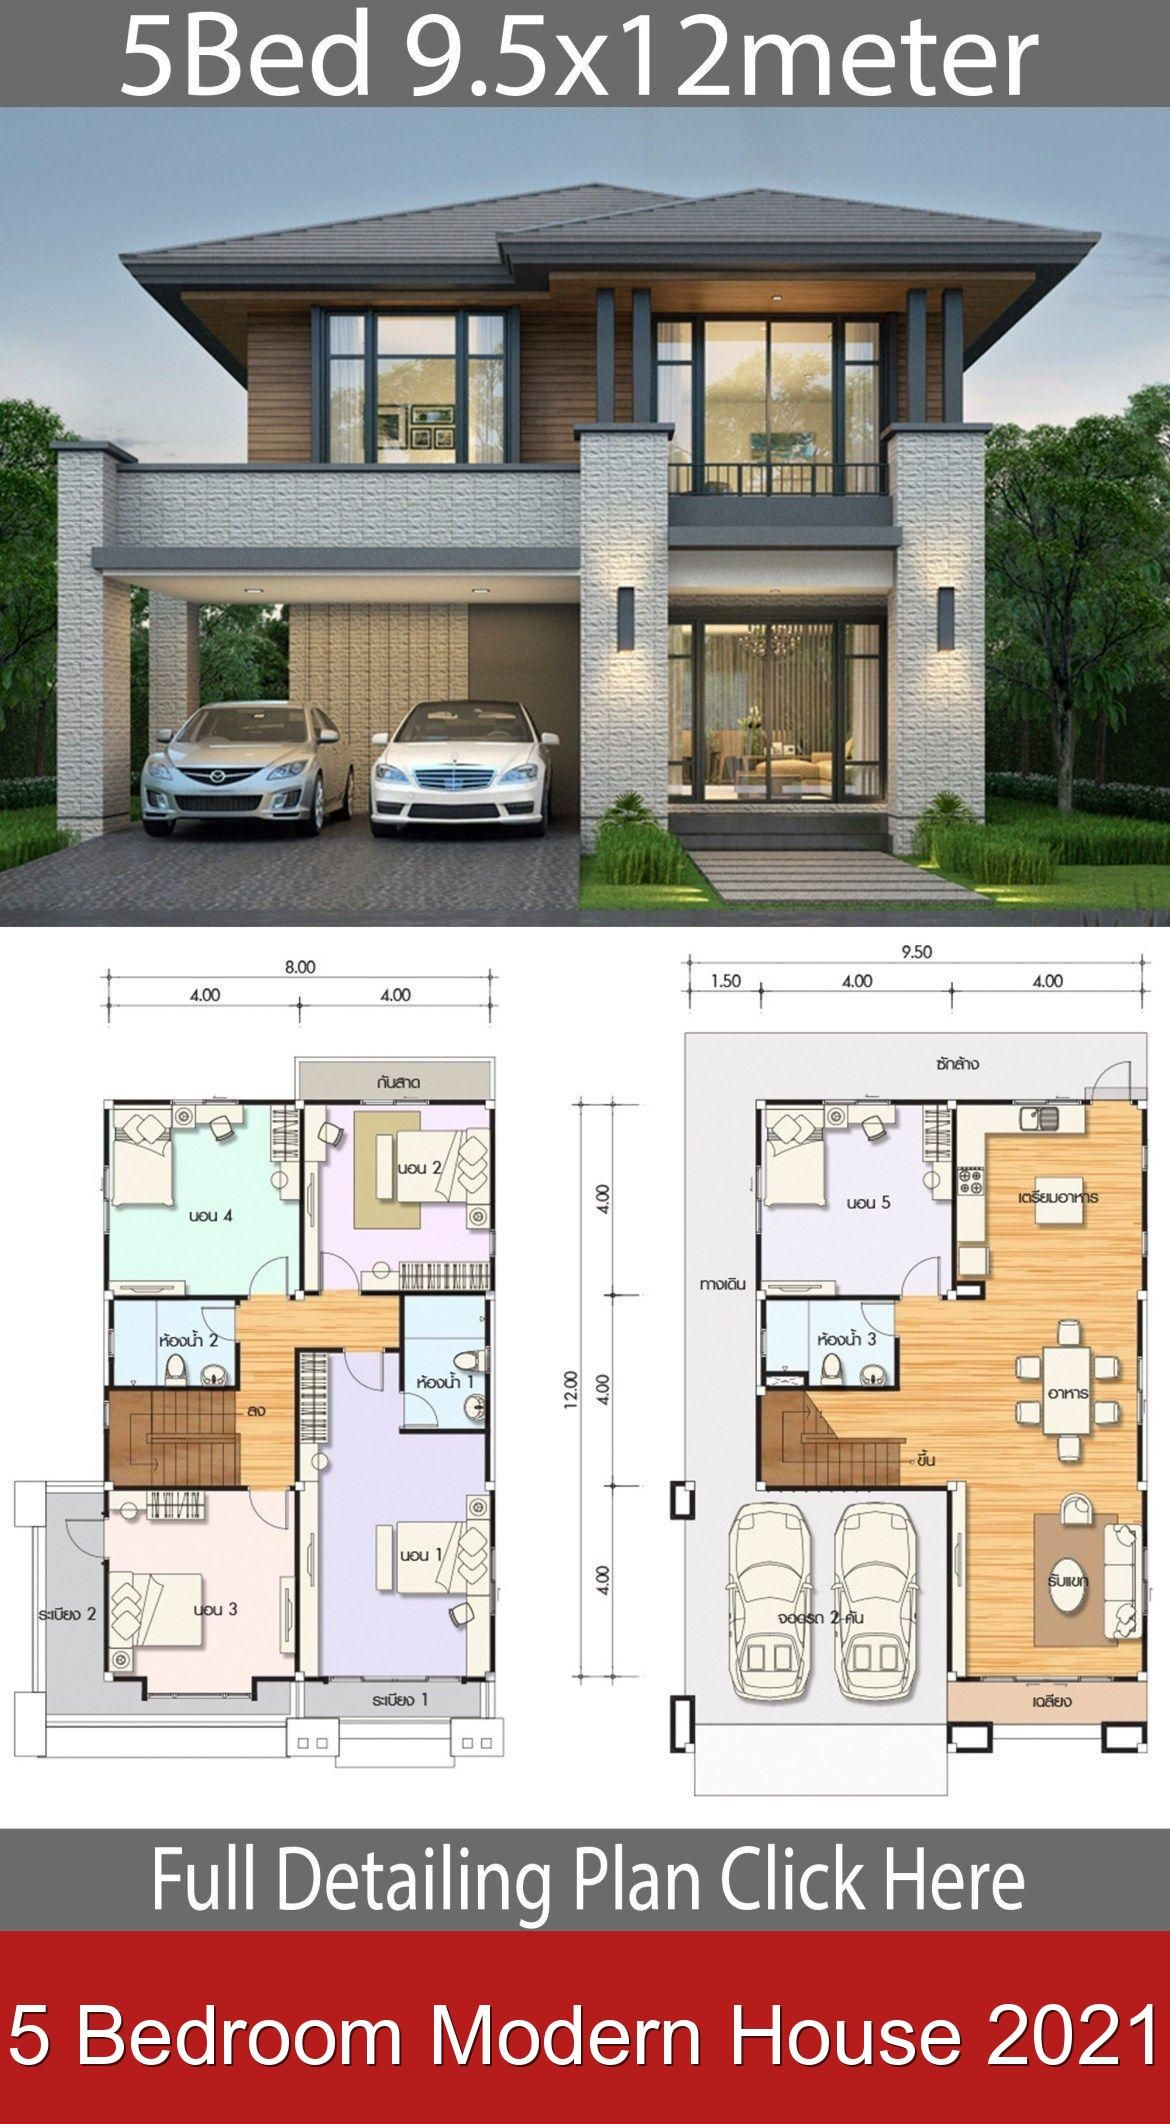 5 Bedroom Modern House 2021 563555 House Design Housedesign 5 Bedroom Modern House 2021 5 Bedroom Em 2020 Sacadas De Casas Projectos De Casas Casa De Arquitetura